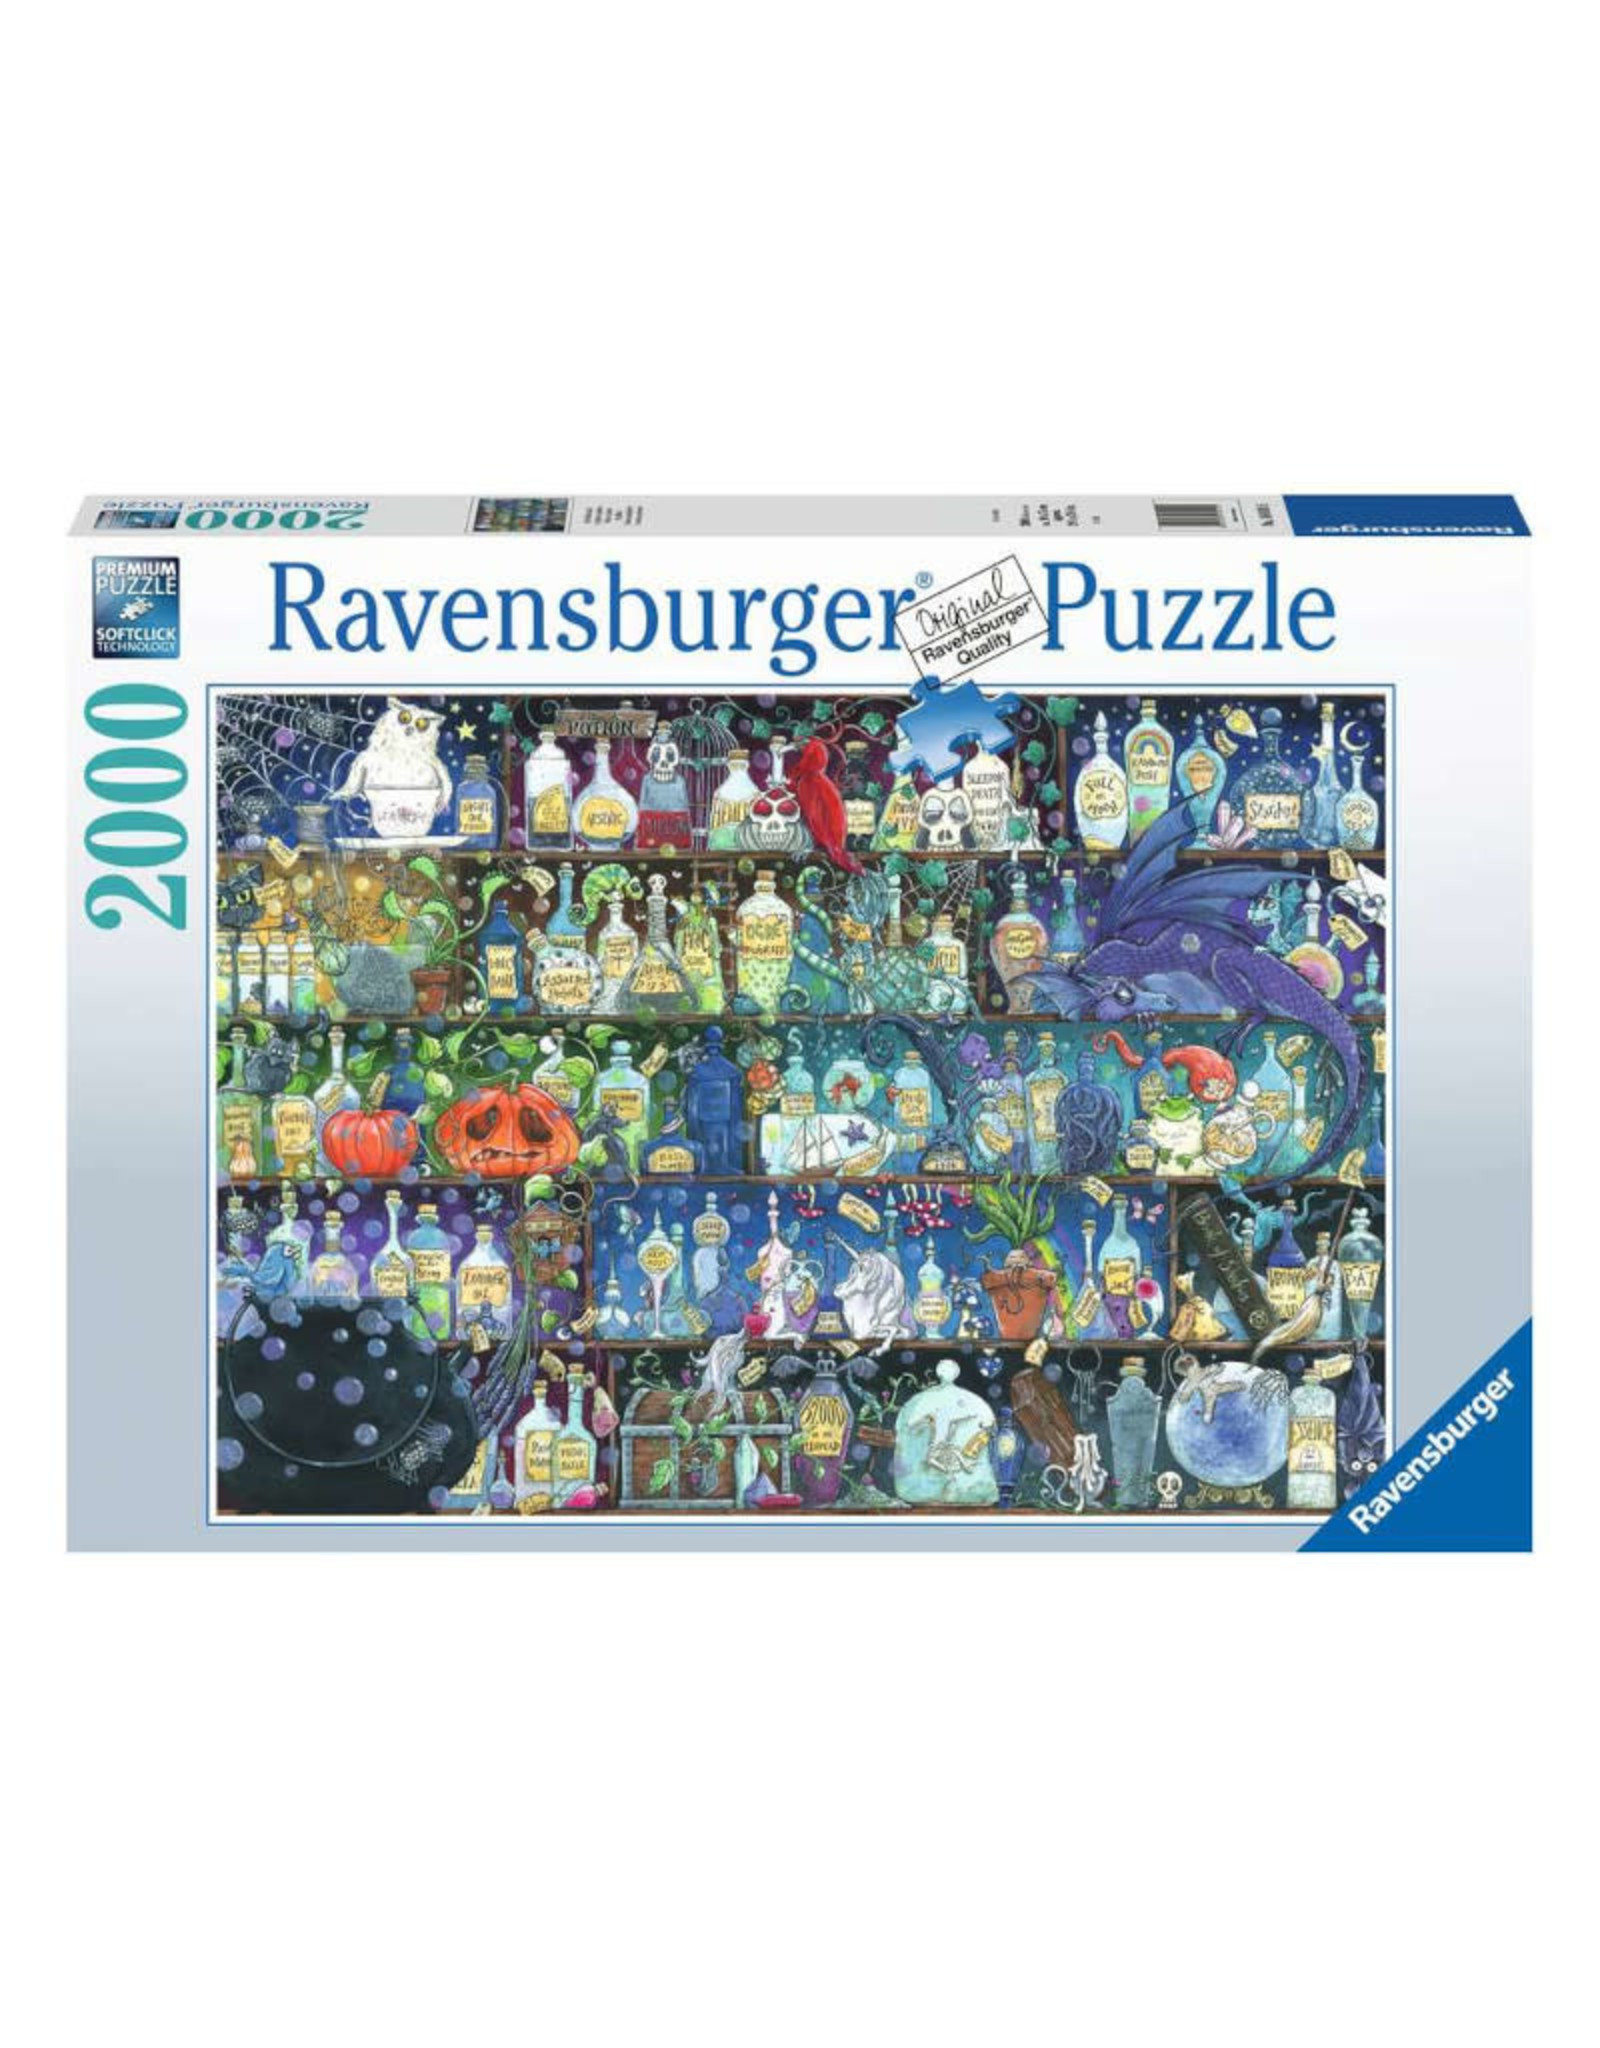 Ravensburger Poisons and Potions Puzzle 2000 PCS